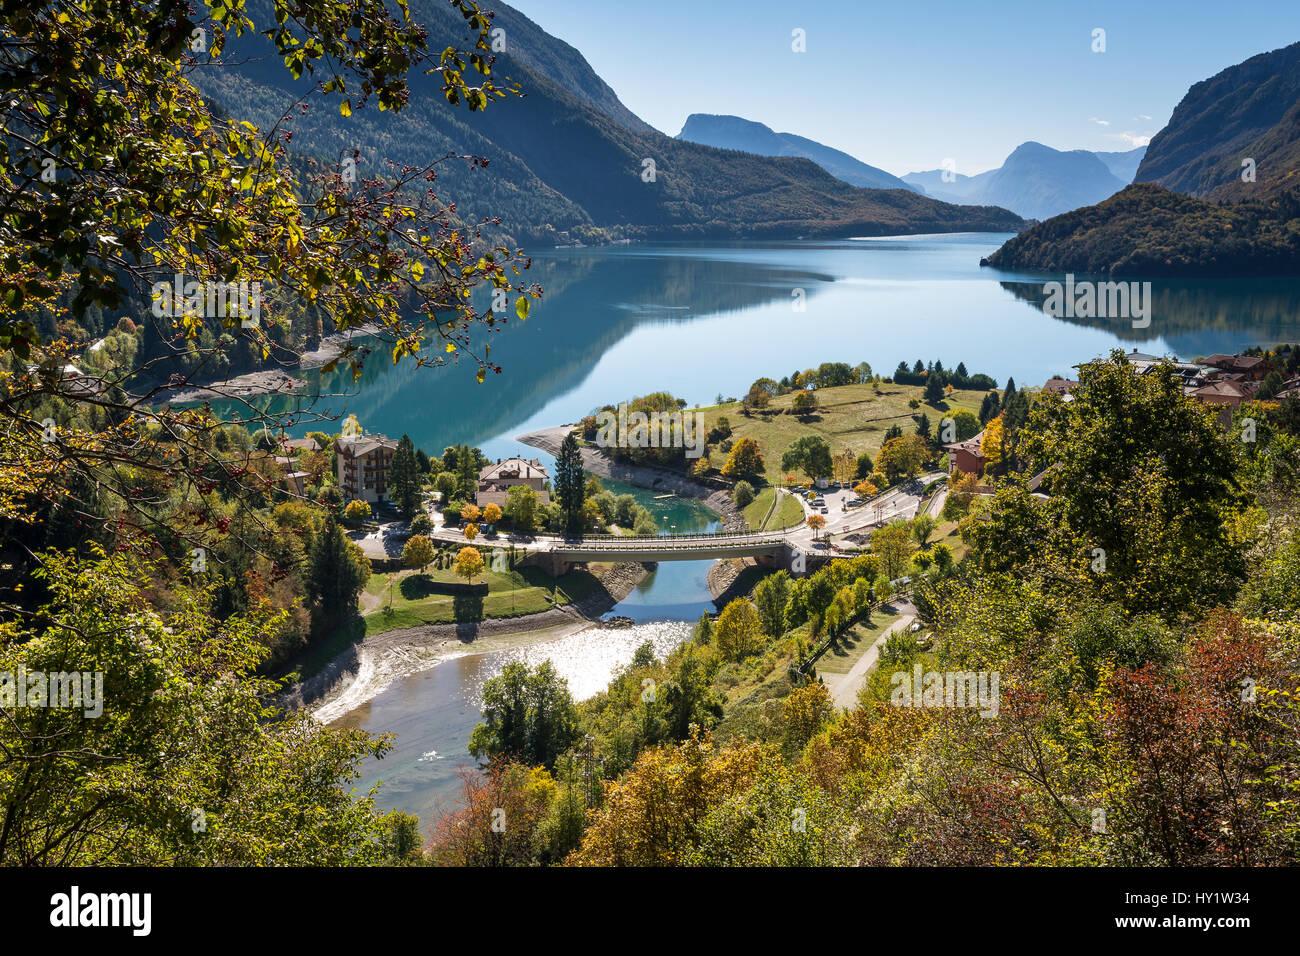 Molveno lake trentino alto adige italy europe stock for Arredamento trentino alto adige